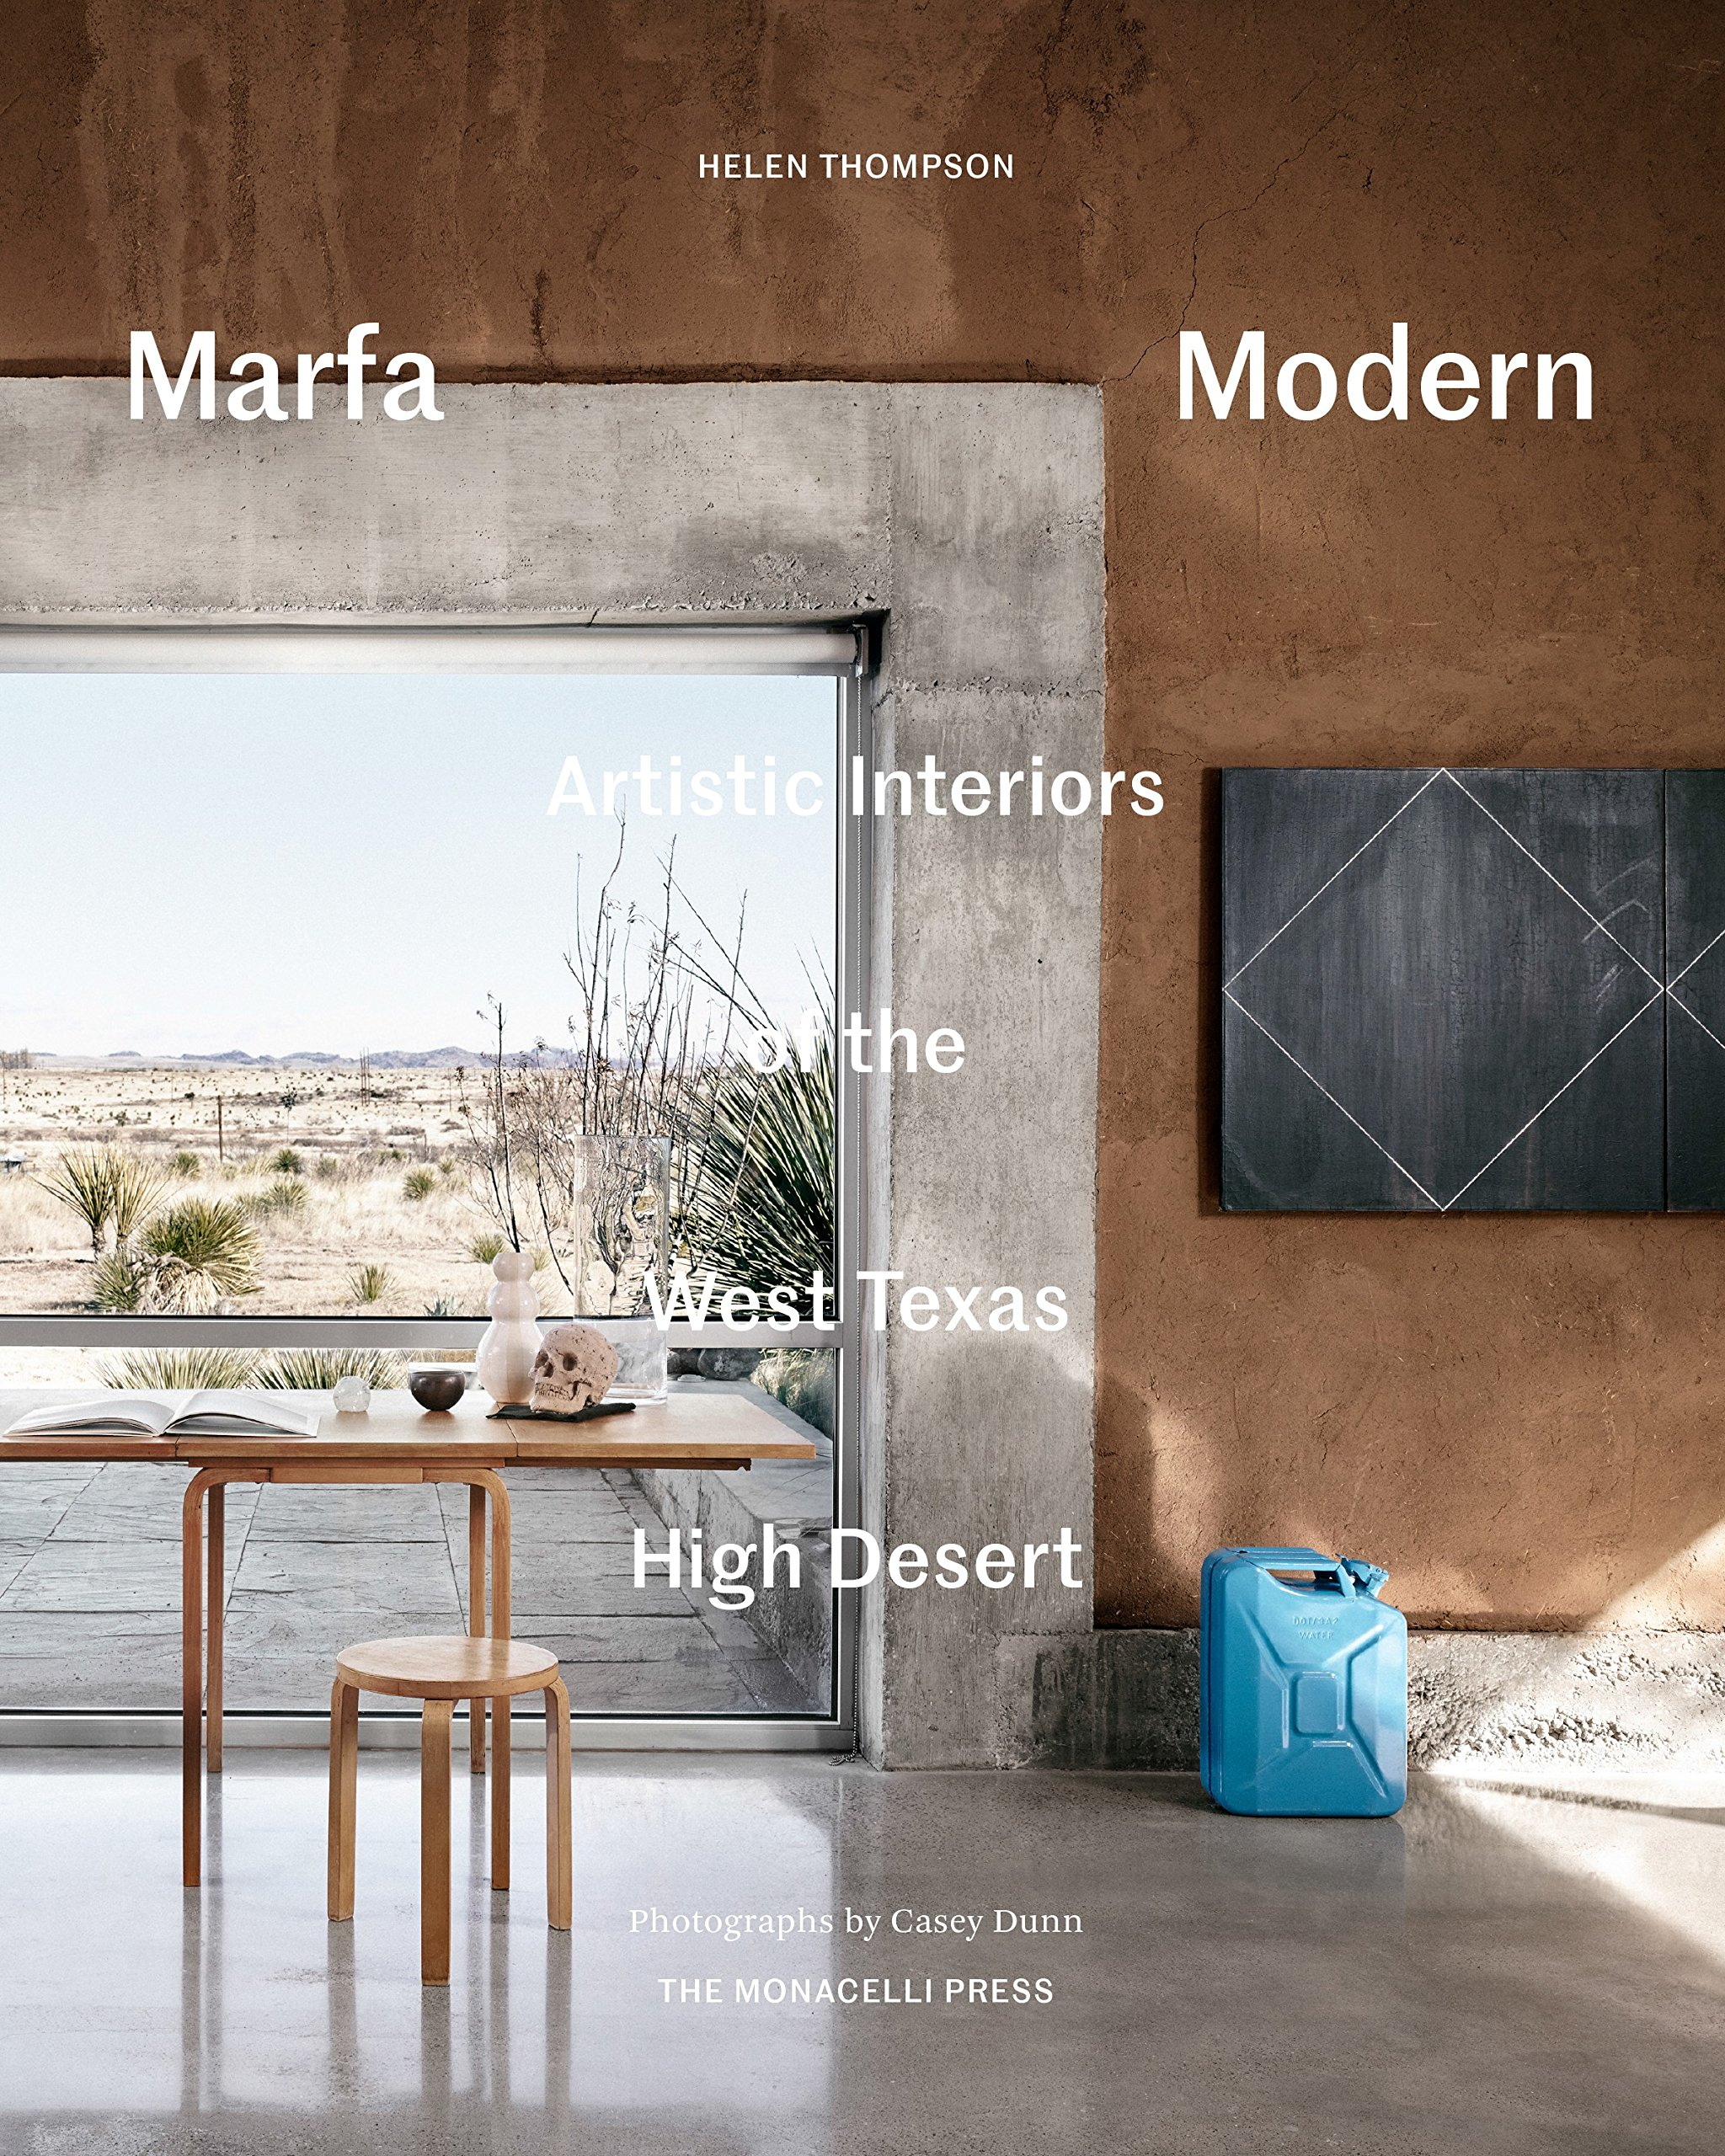 Marfa Modern: Artistic Interiors Of The West Texas High Desert: Helen  Thompson, Casey Dunn: 9781580934732: Amazon.com: Books